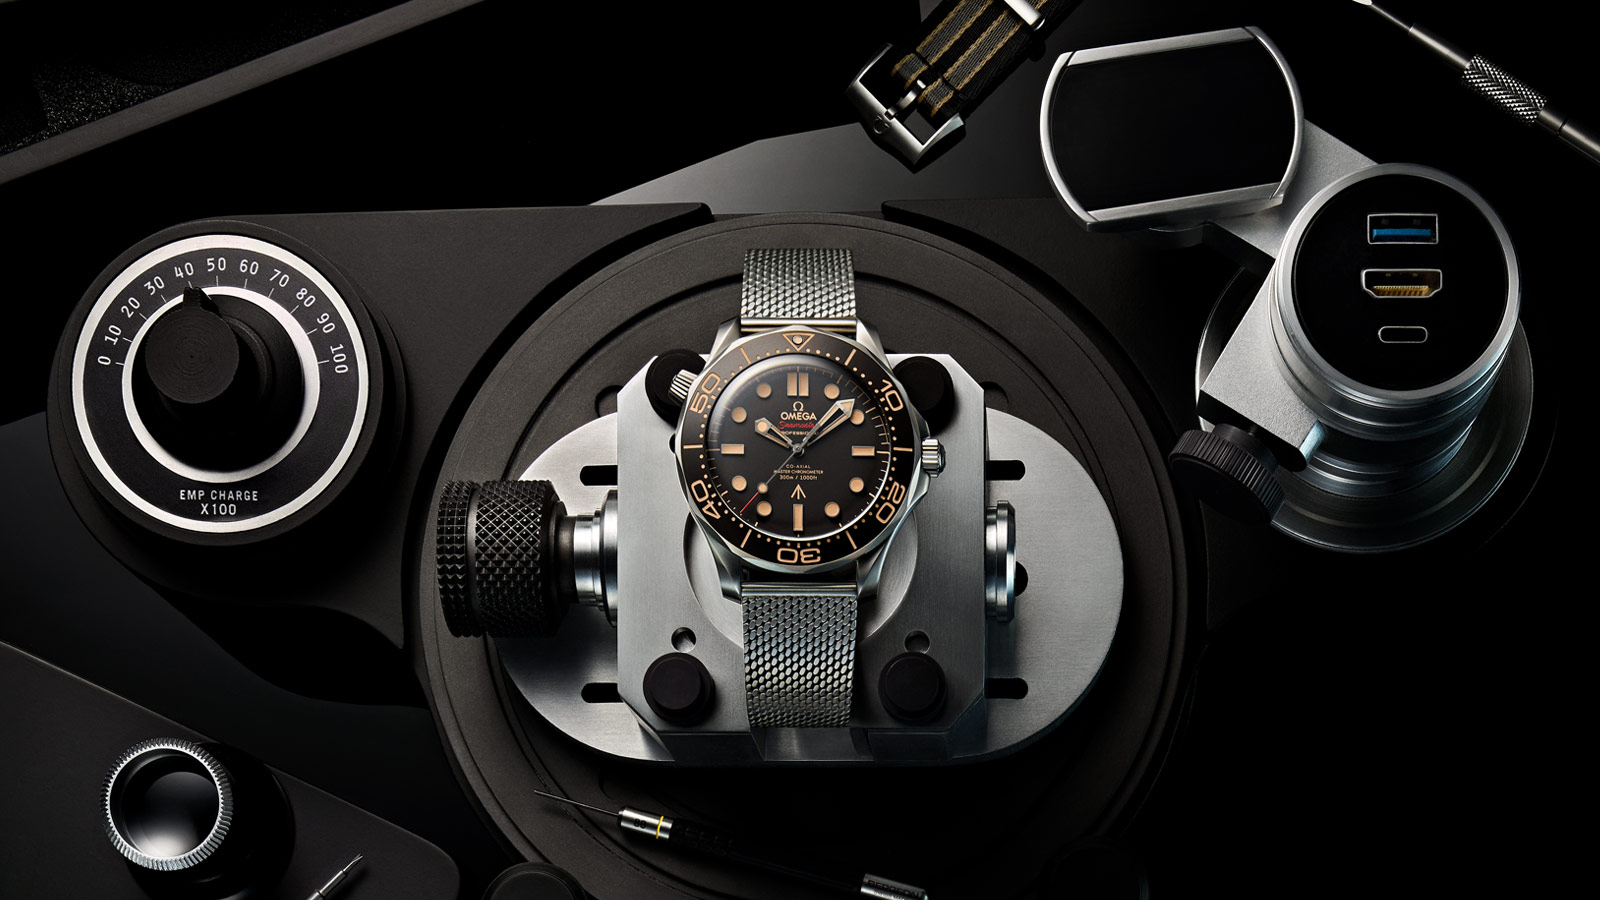 omega-seamaster-diver-300m-007-edition